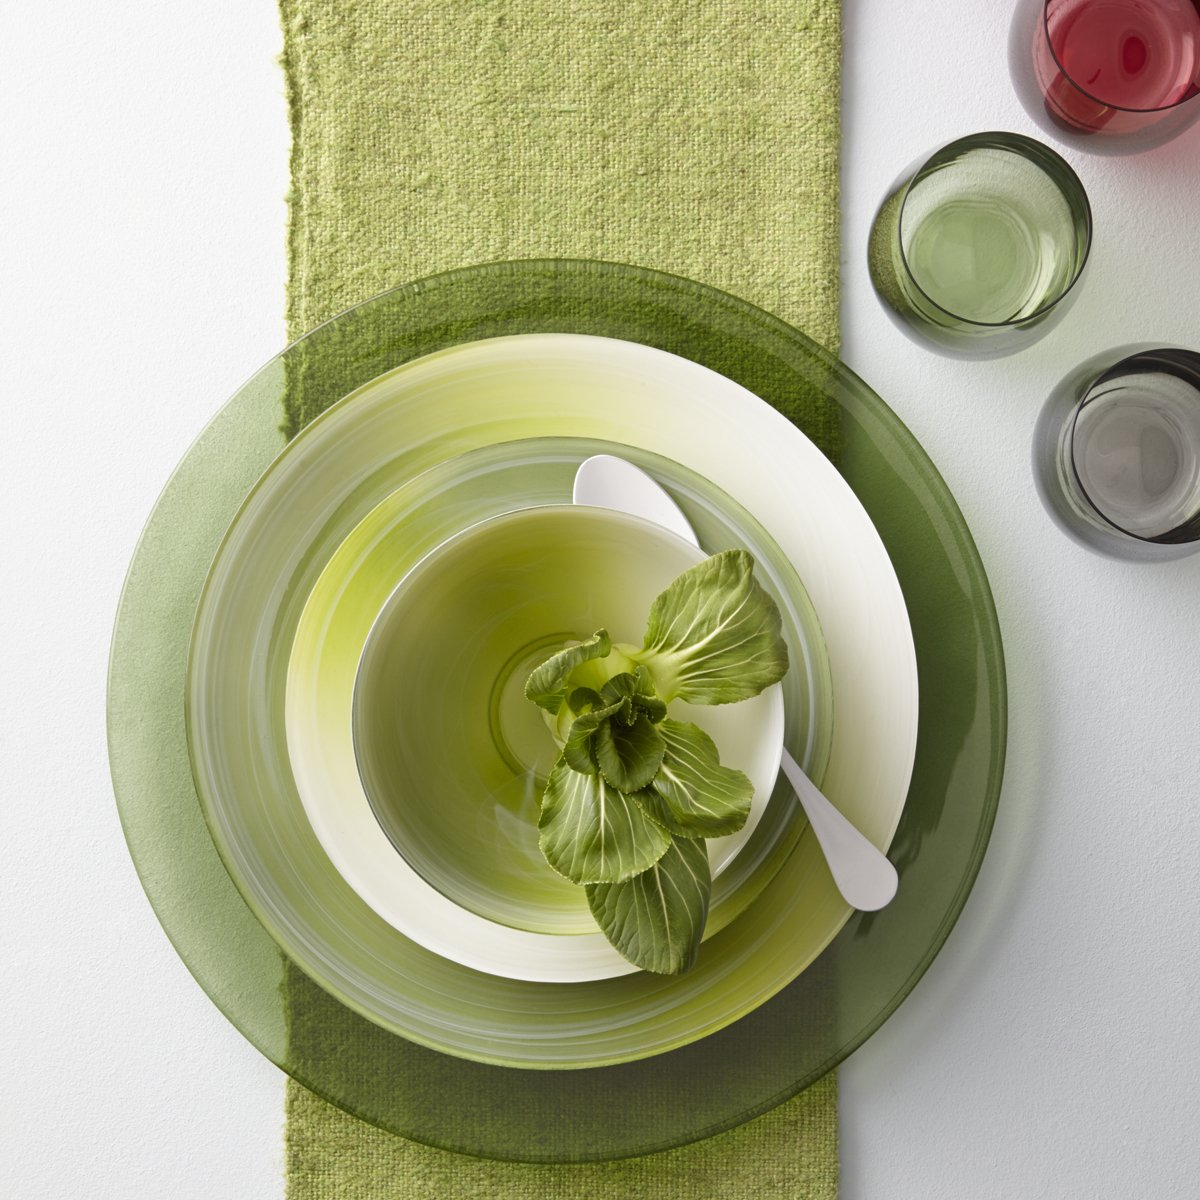 71fcW9b1HL. SL1200  - Bol Giardino verde 24 cm (L028253)